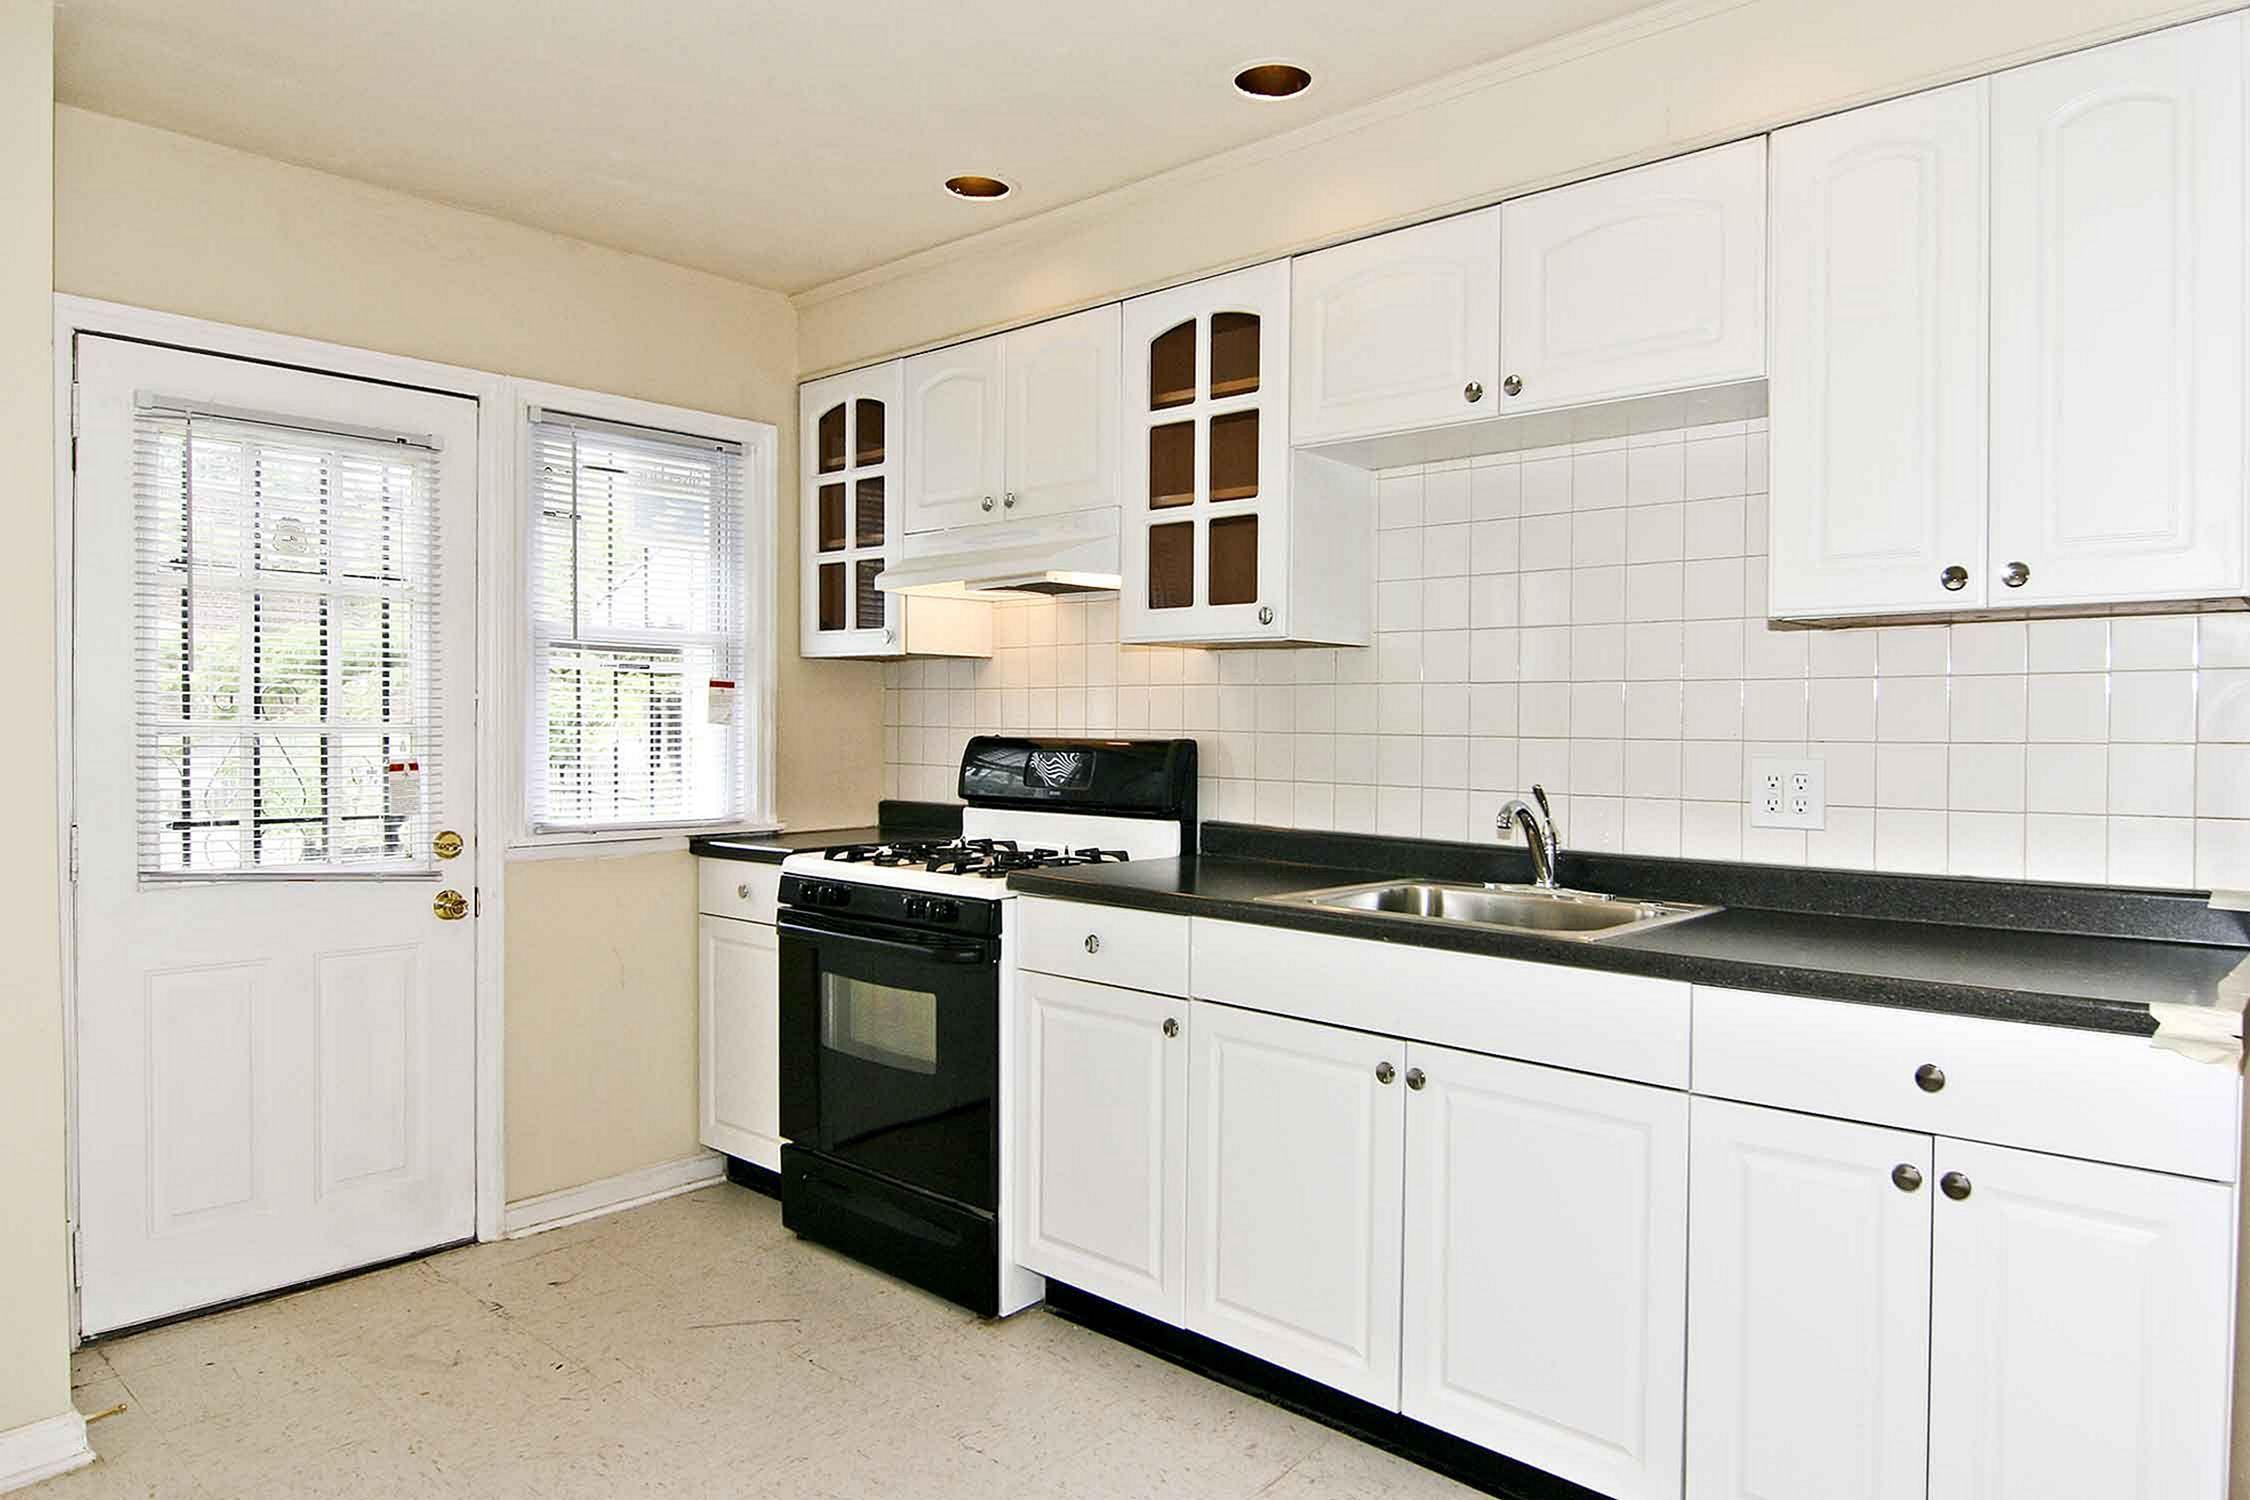 Elegant 25 White Kitchen Cabinet For Kitchen Looks More Clean In 2020 Kitchen Cabinet Design Cheap Kitchen Cabinets Clean Kitchen Cabinets